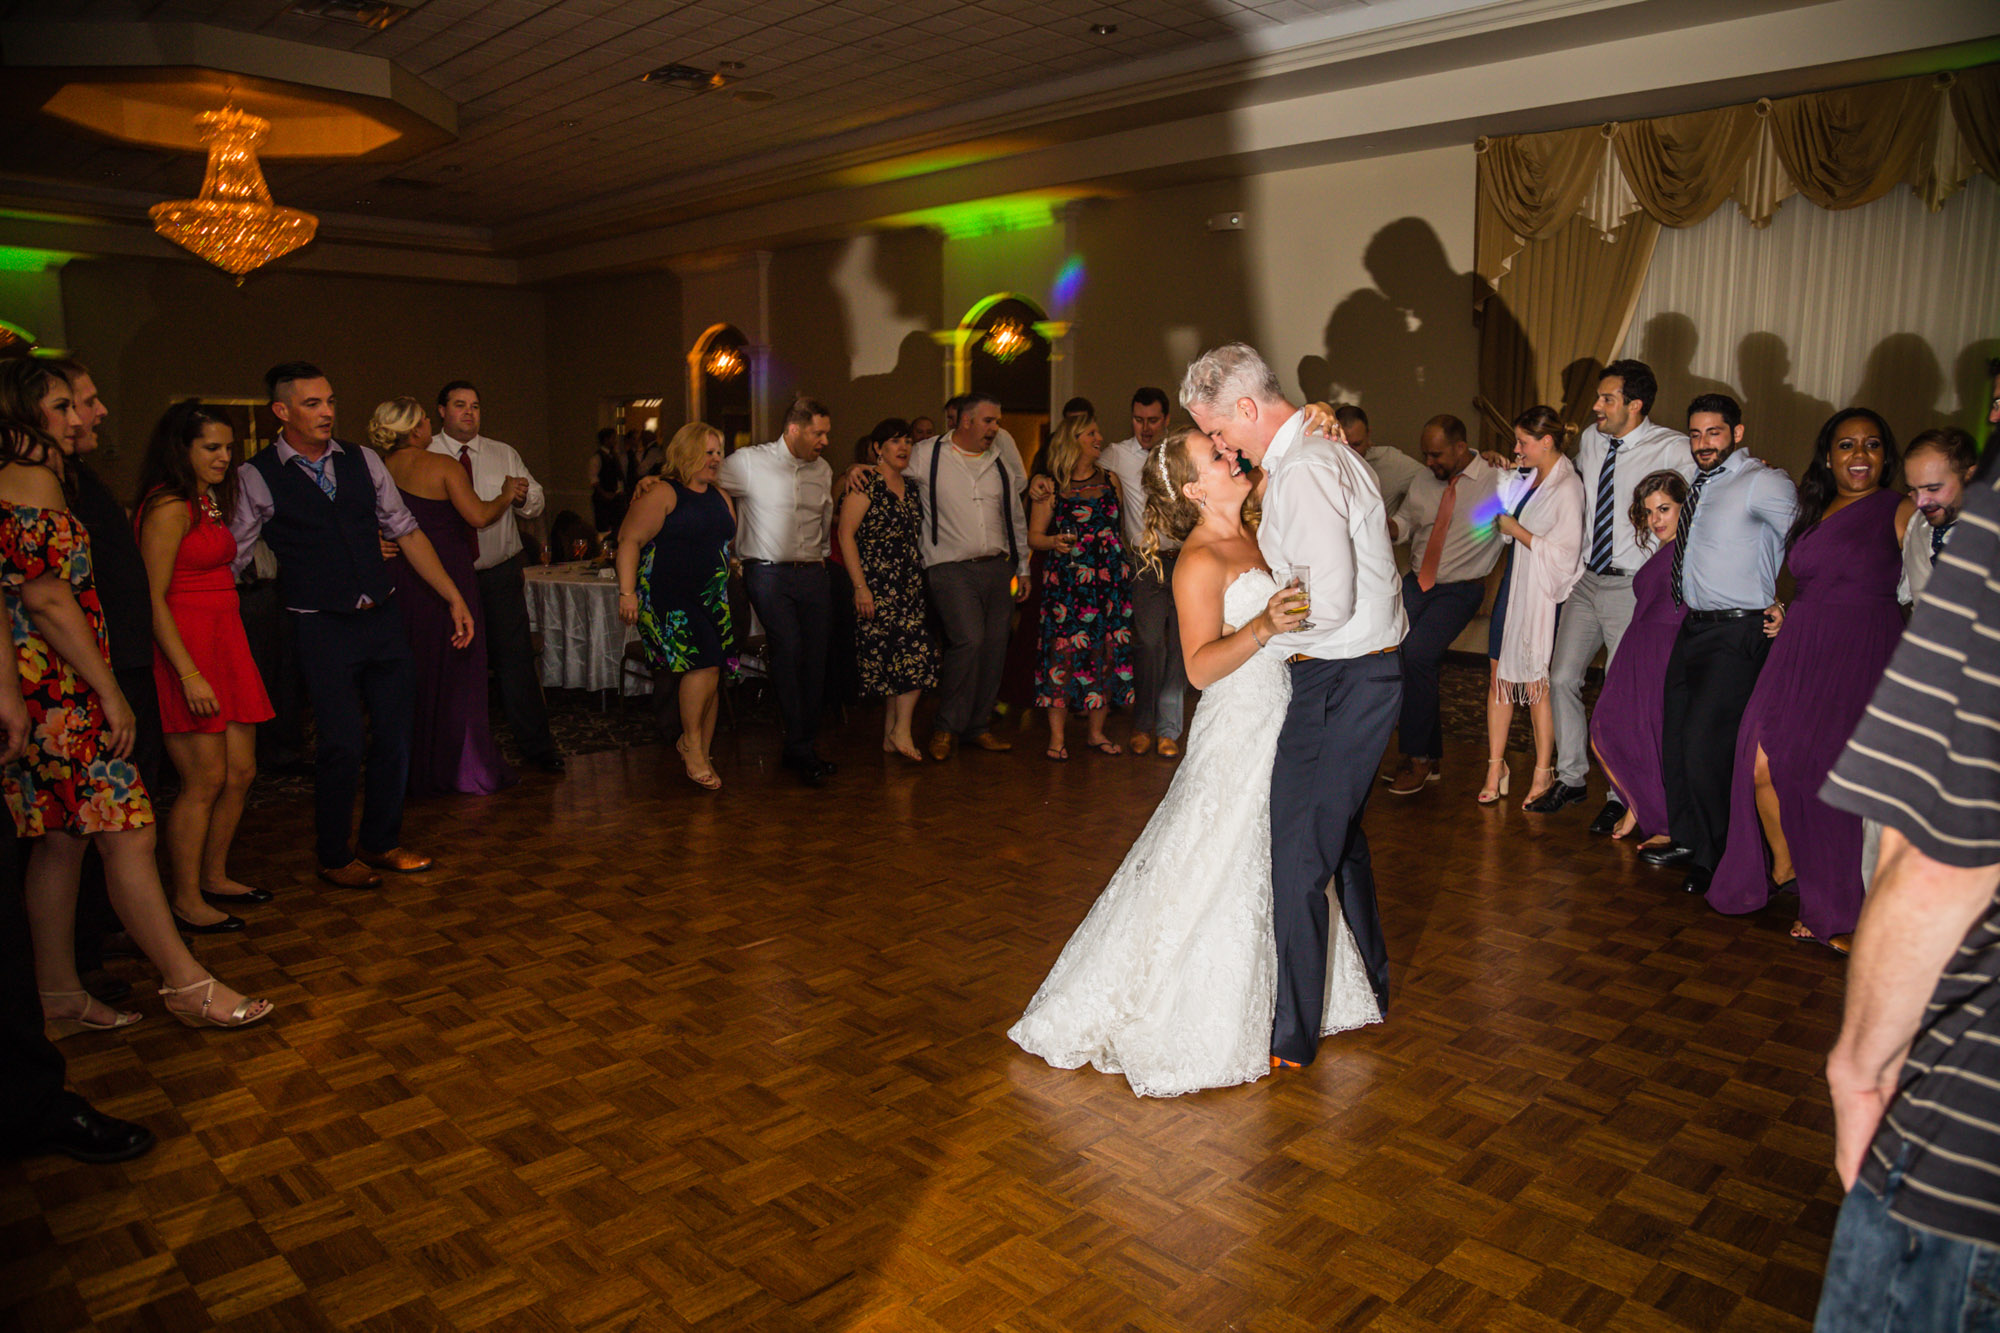 scranton_wedding_photographer_lettieri_pa (46 of 47).jpg